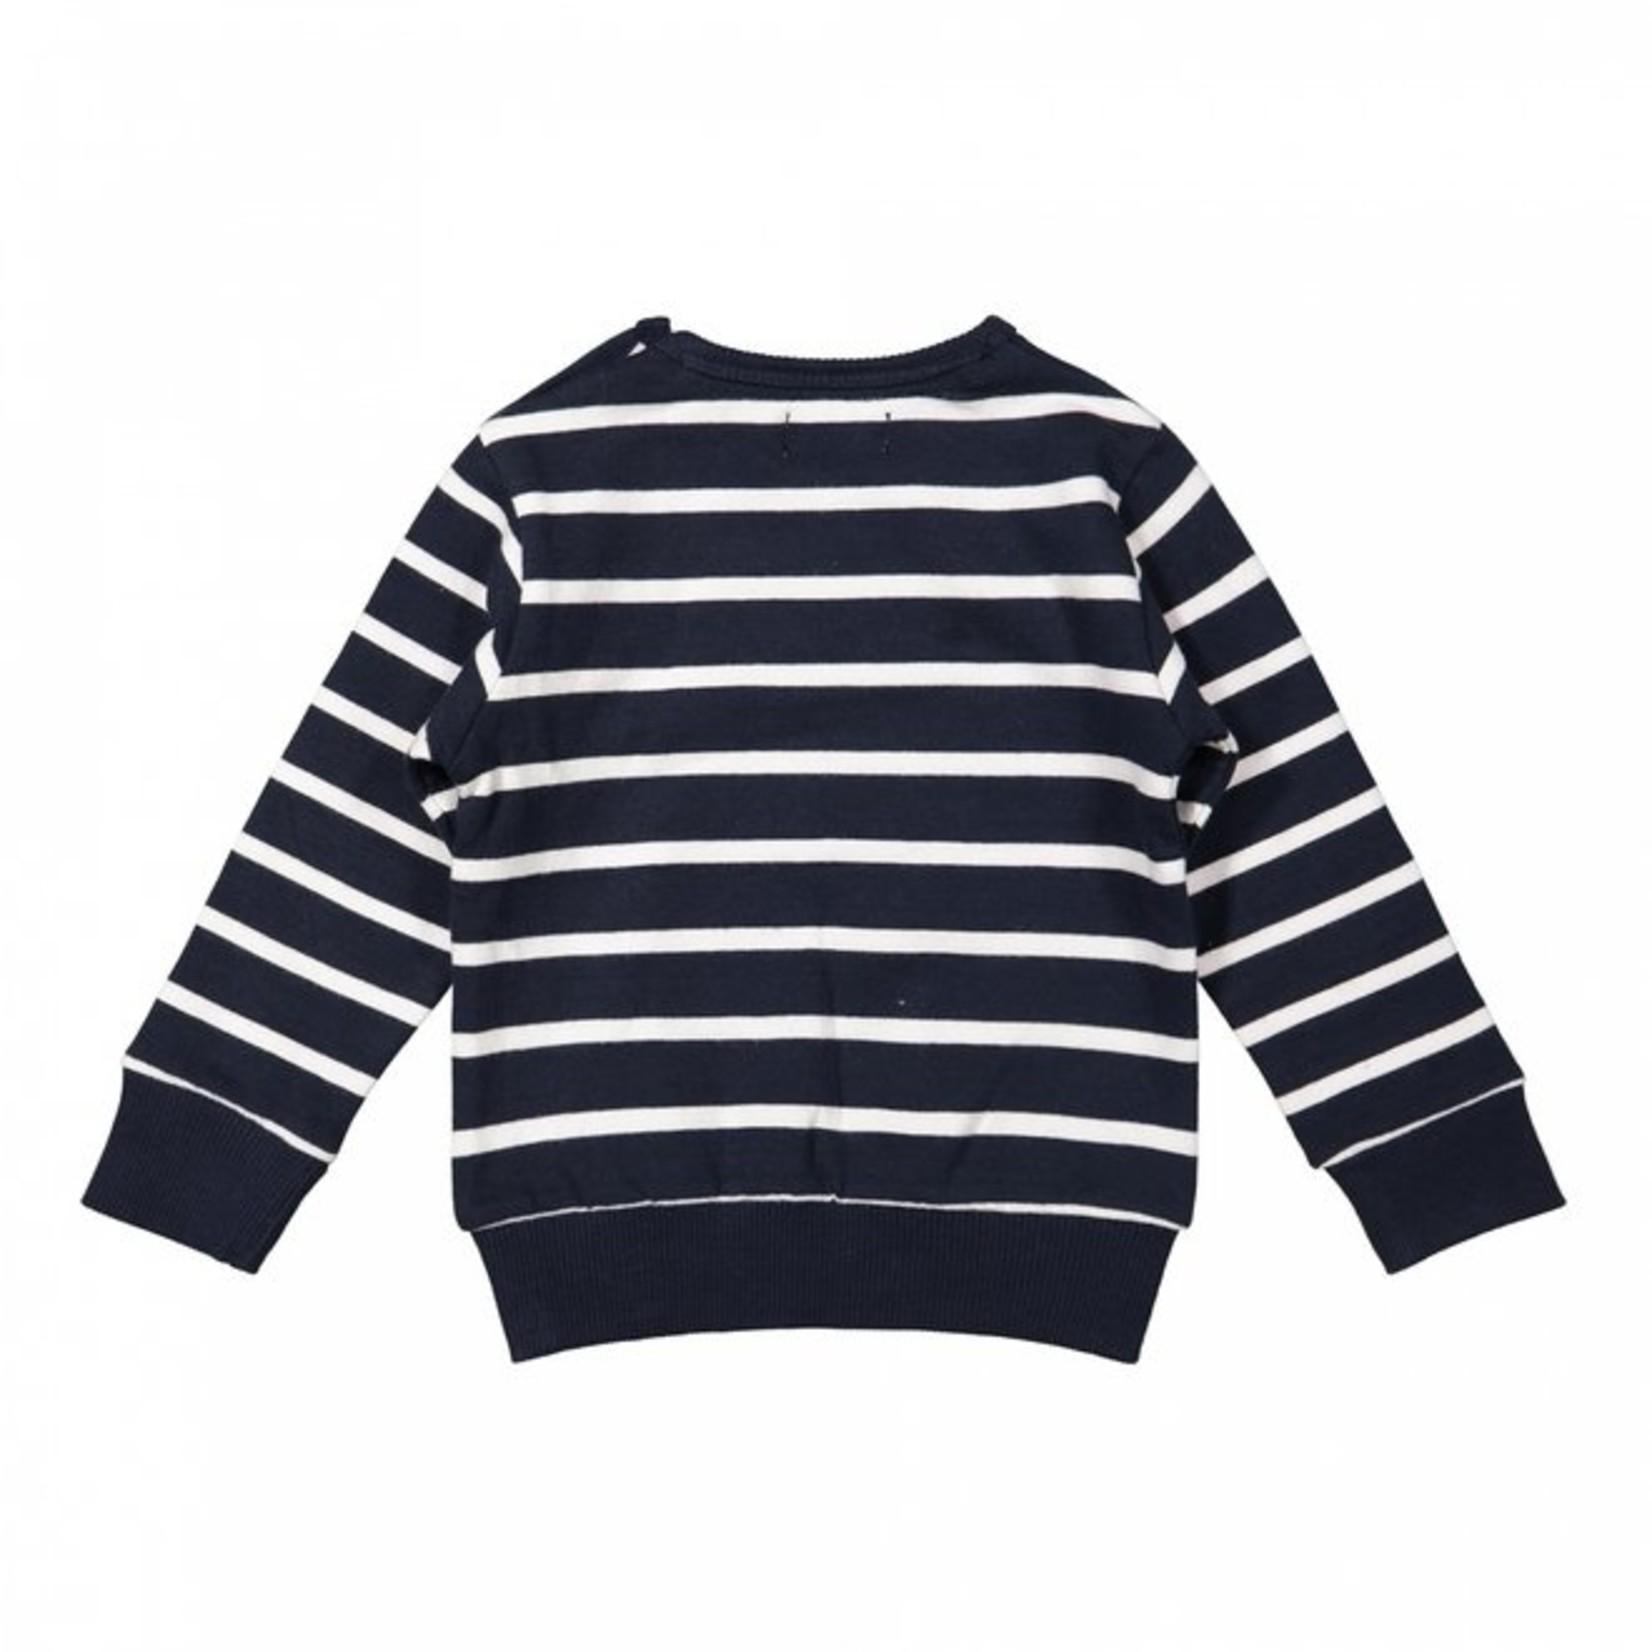 Dirkje Jongens sweater donkerblauw gestreept